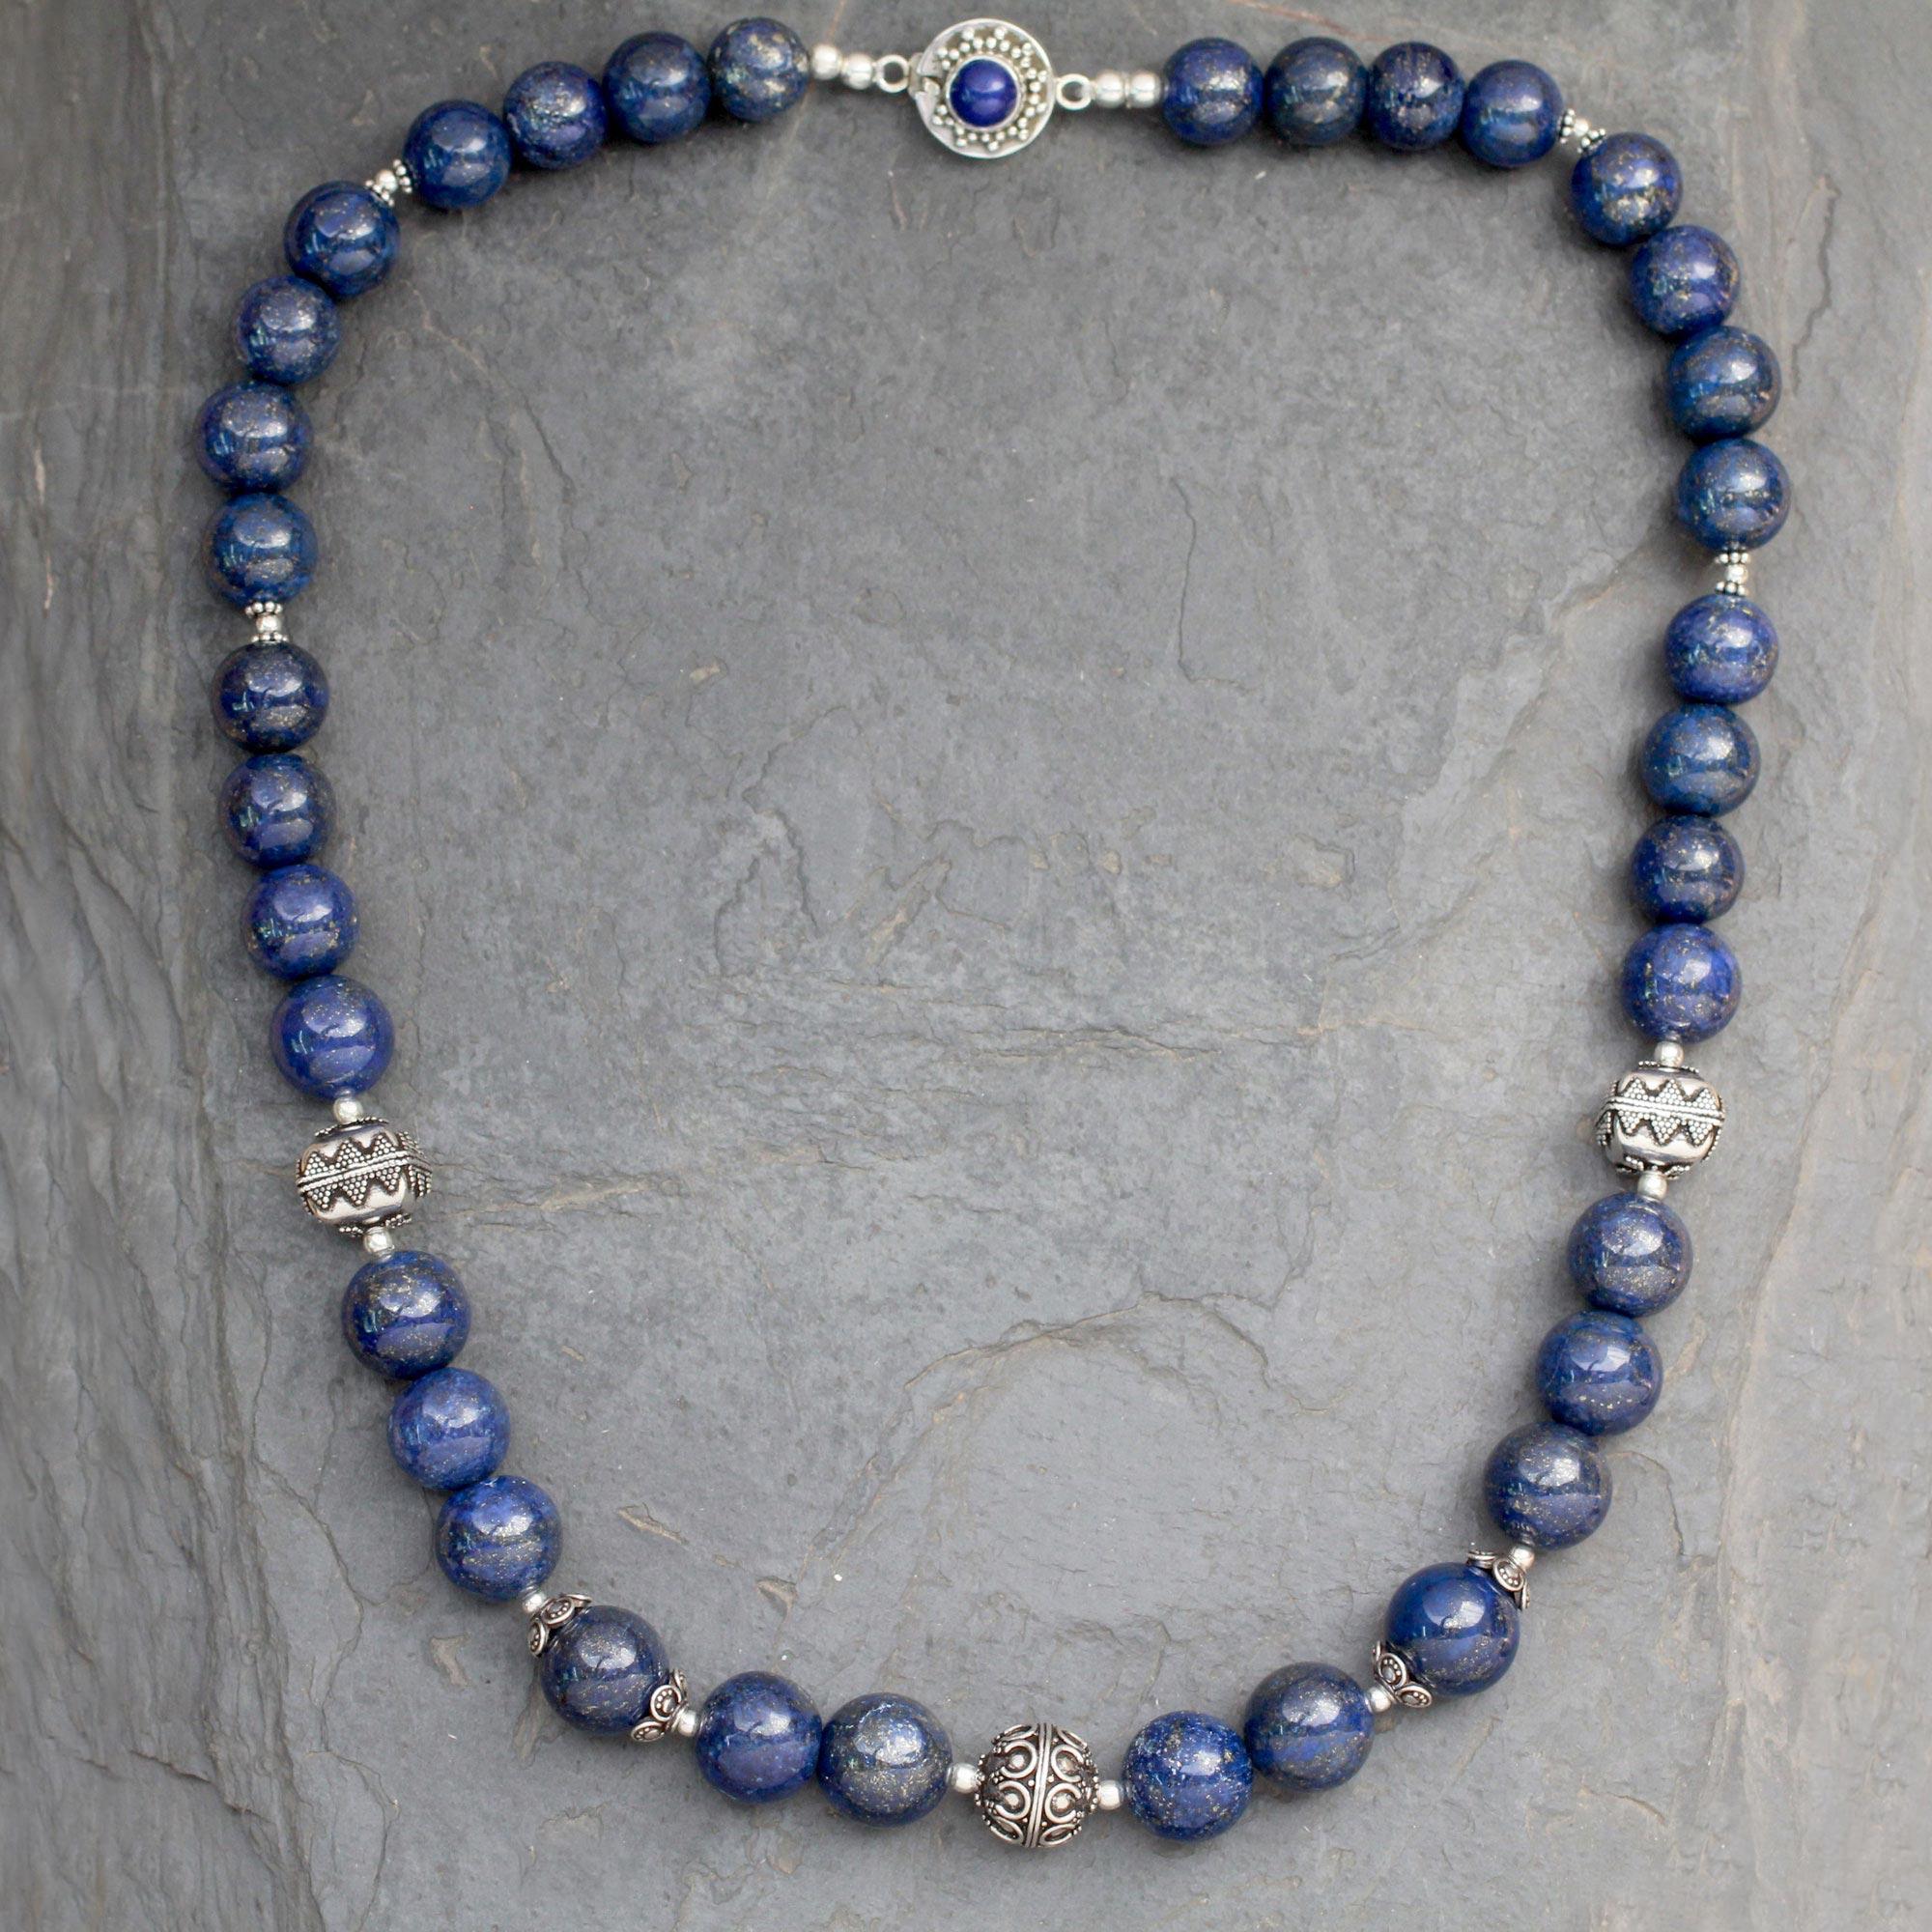 High Fashion Beaded Jewelry